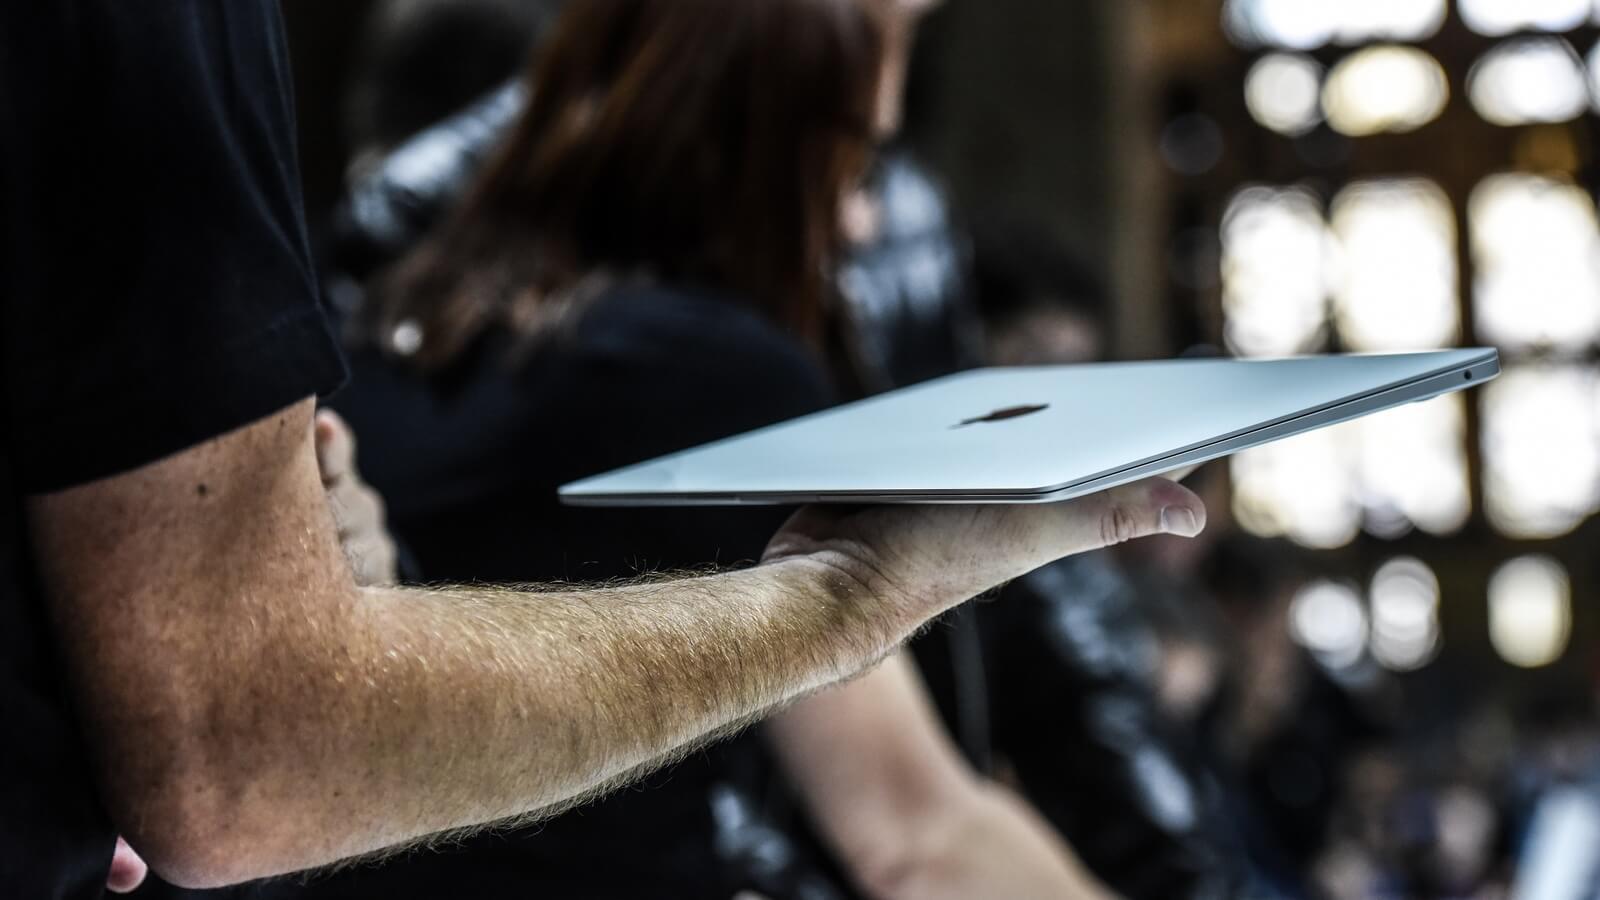 Apple отложила старт продаж новых MacBook Air, Mac Mini и iPad Pro в России — The IT-Files